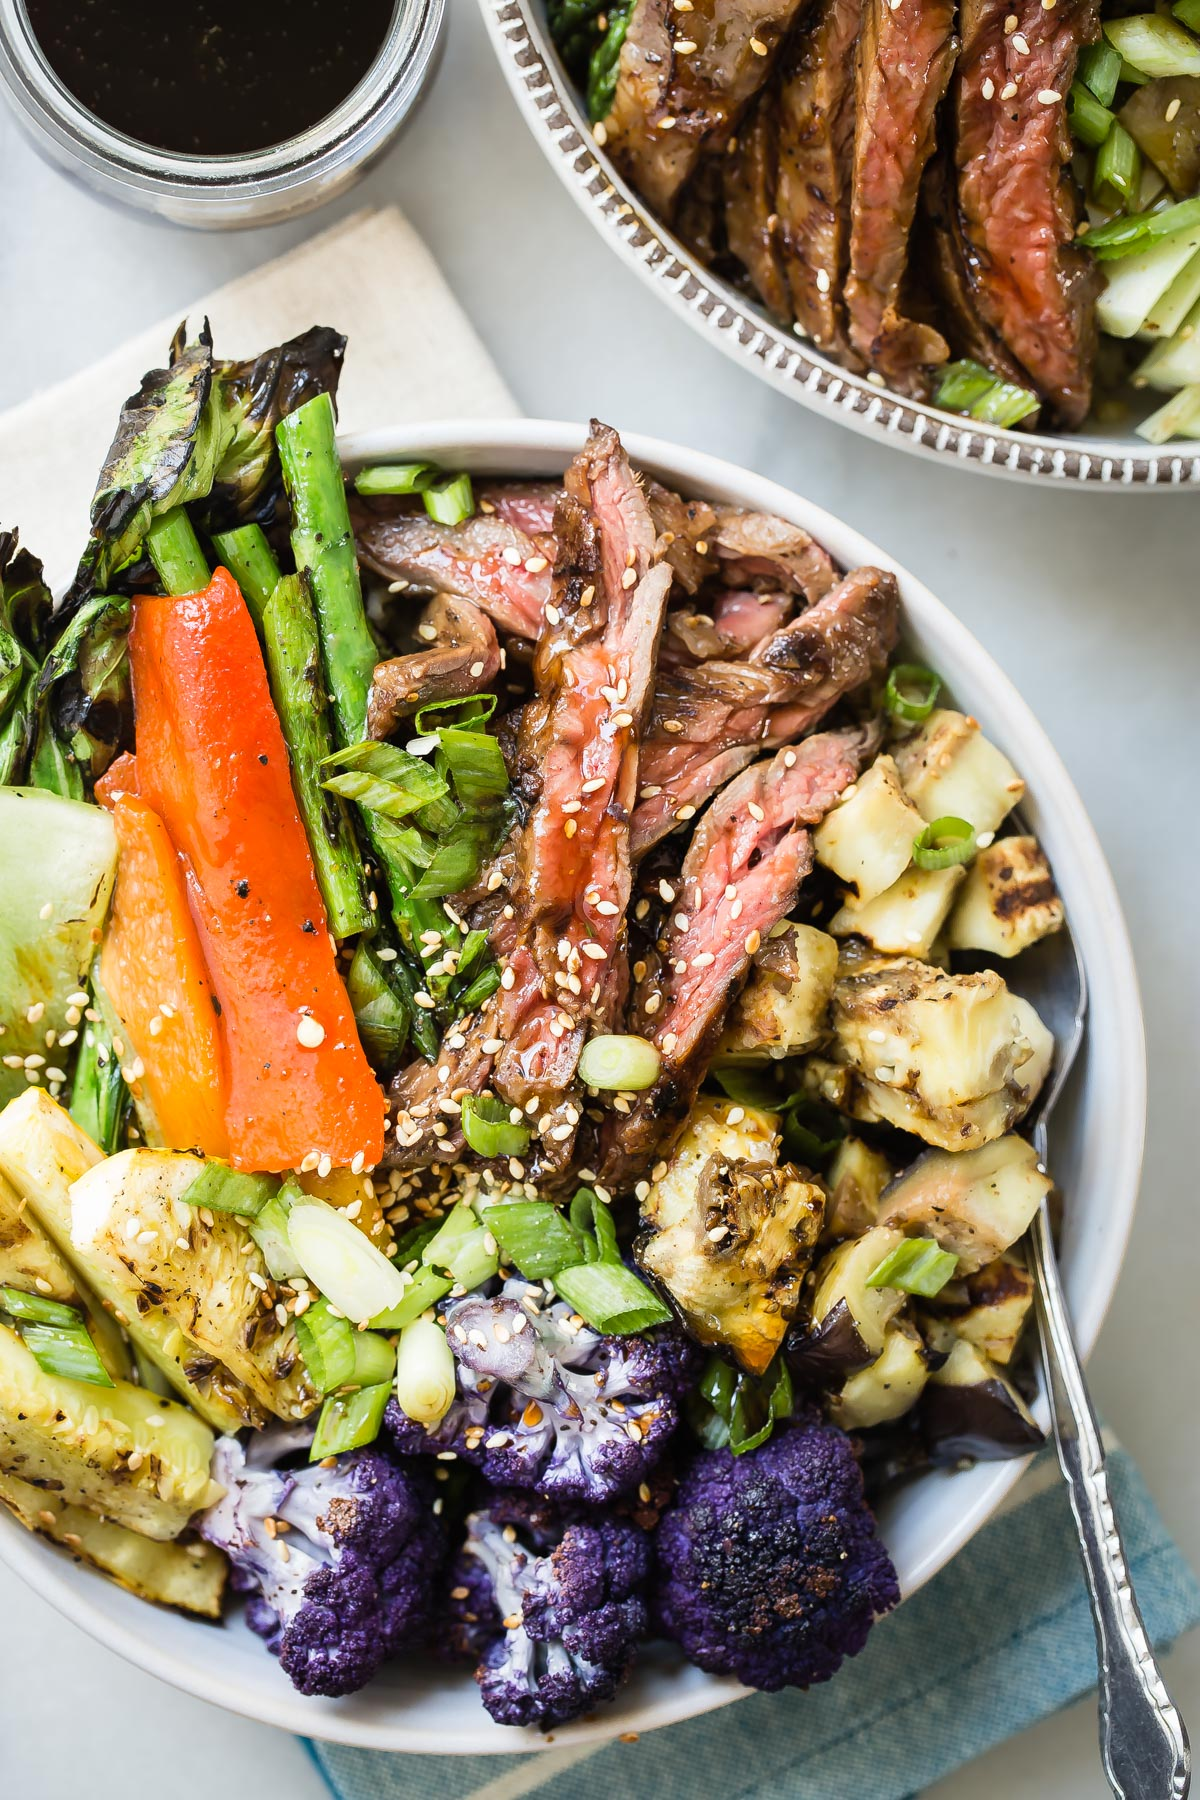 Grilled Steak & Veggies Bowl